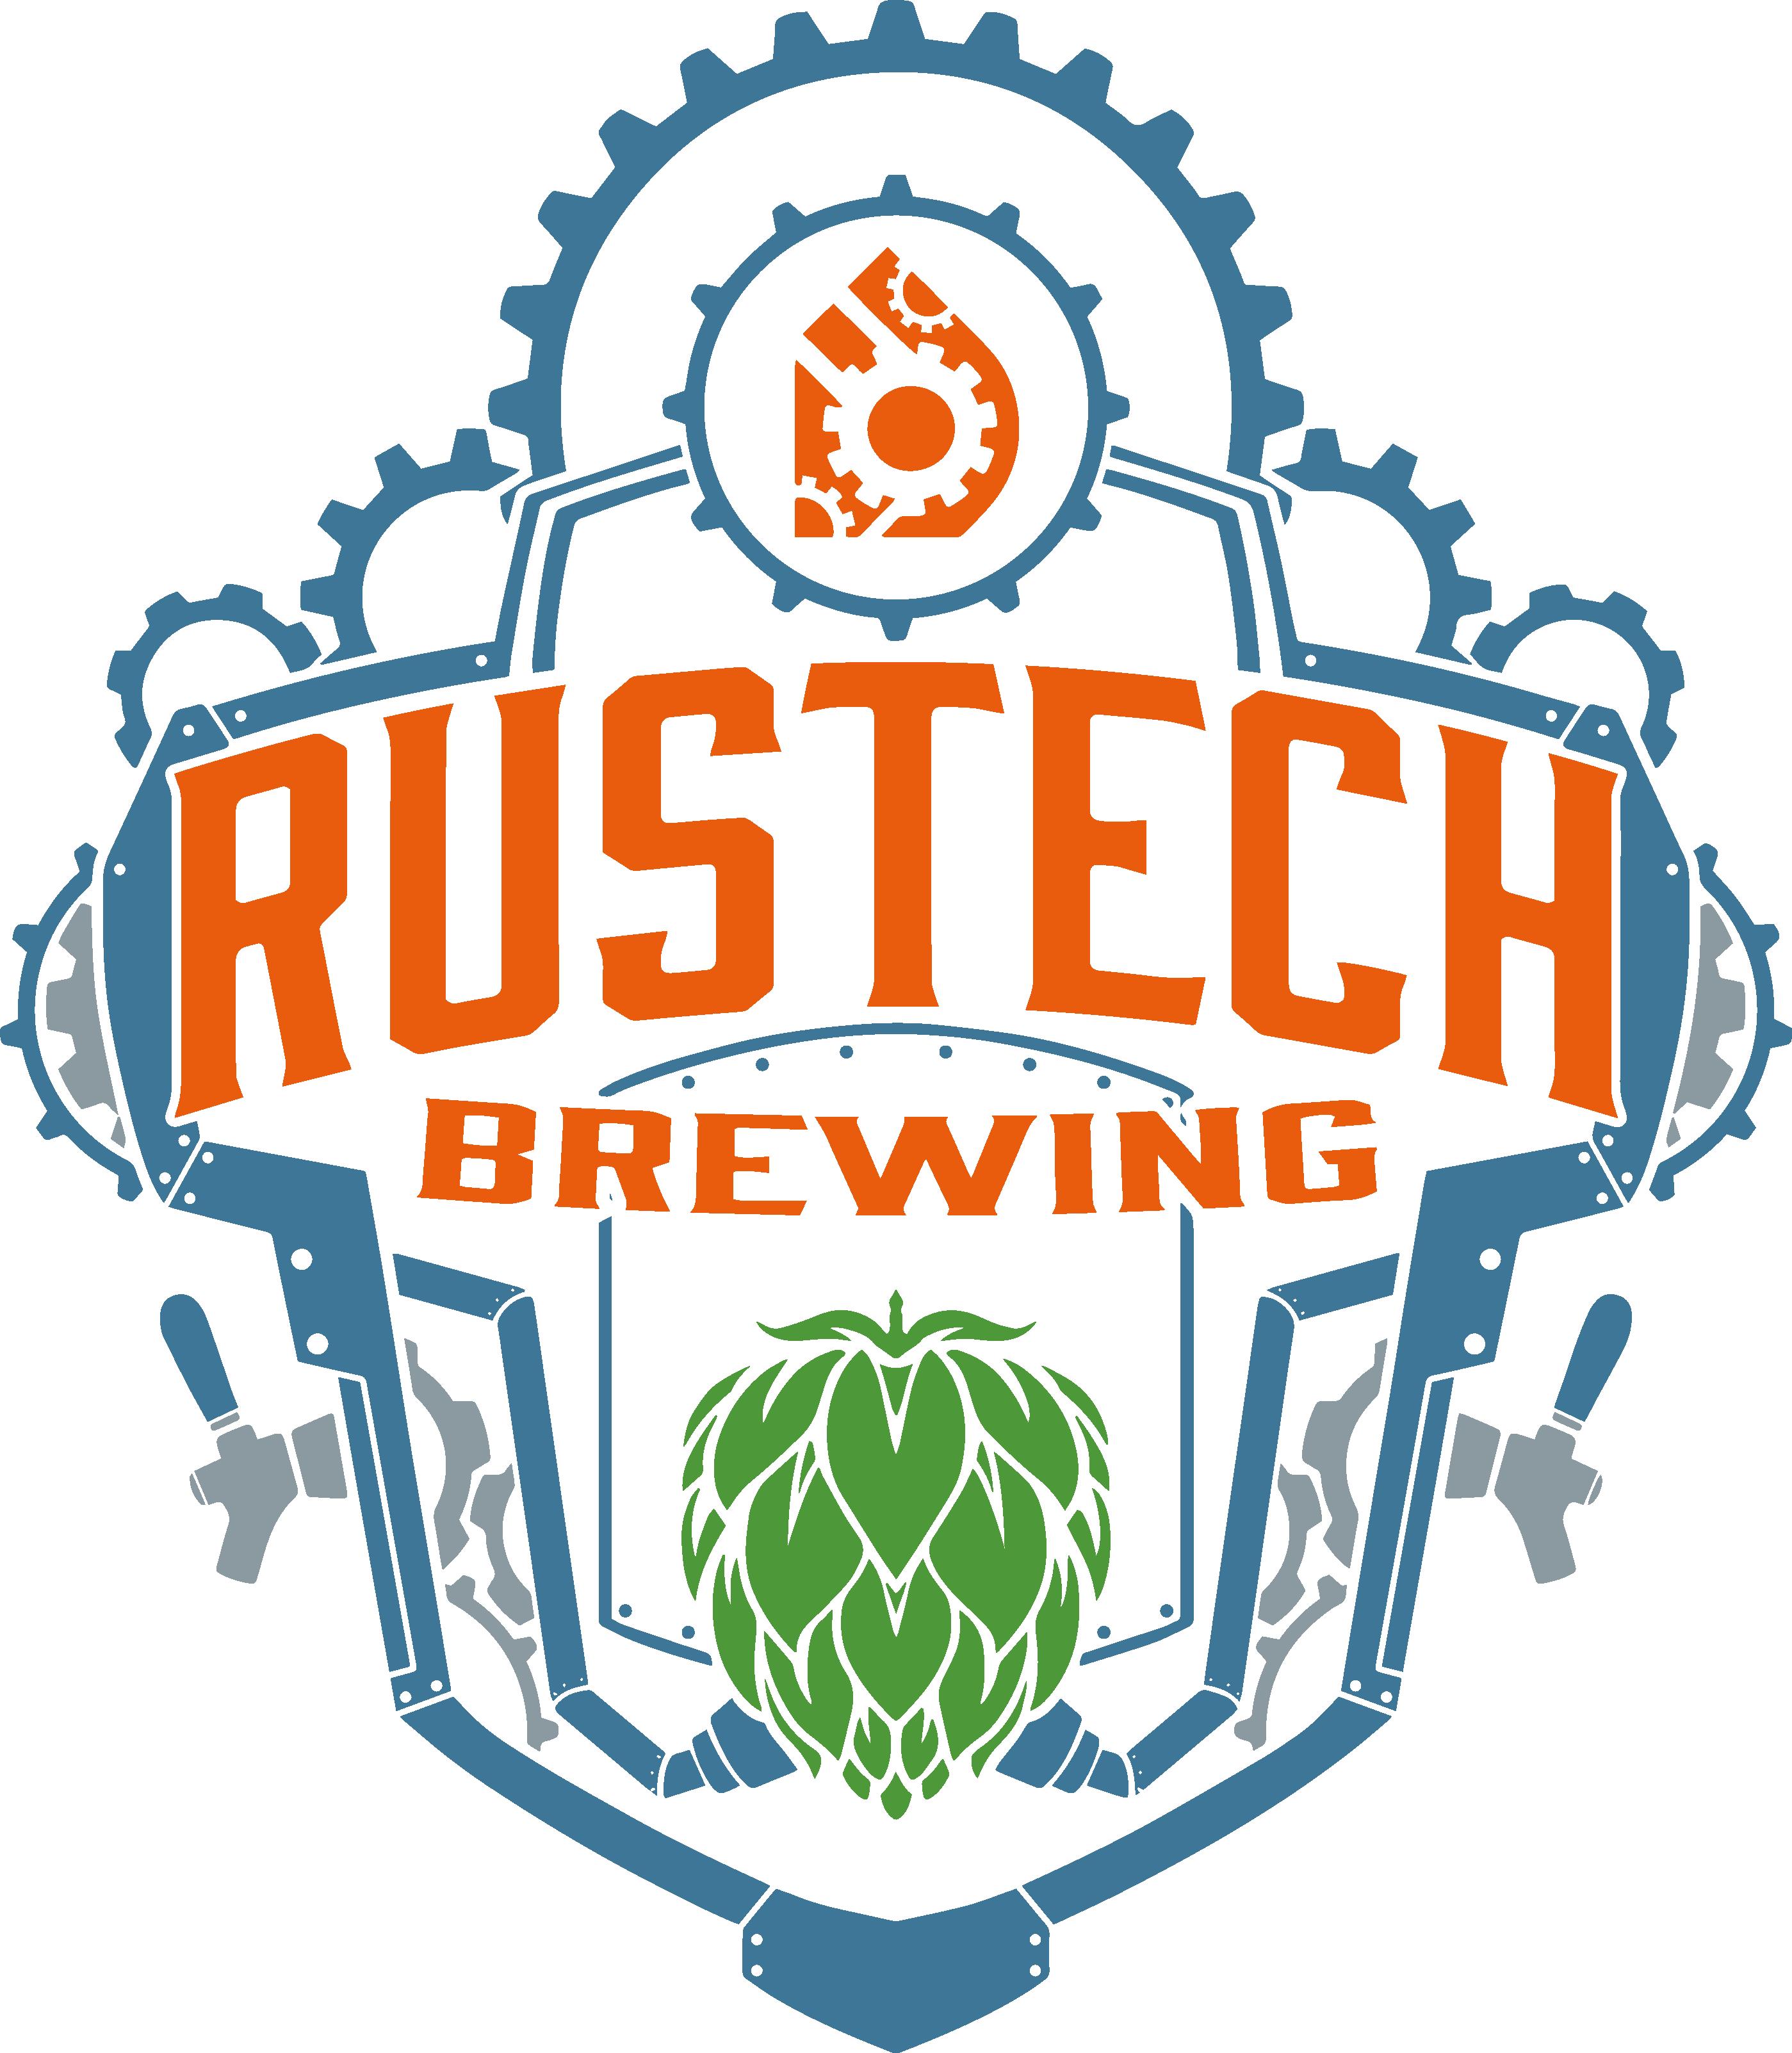 Rustech Brewing Logo